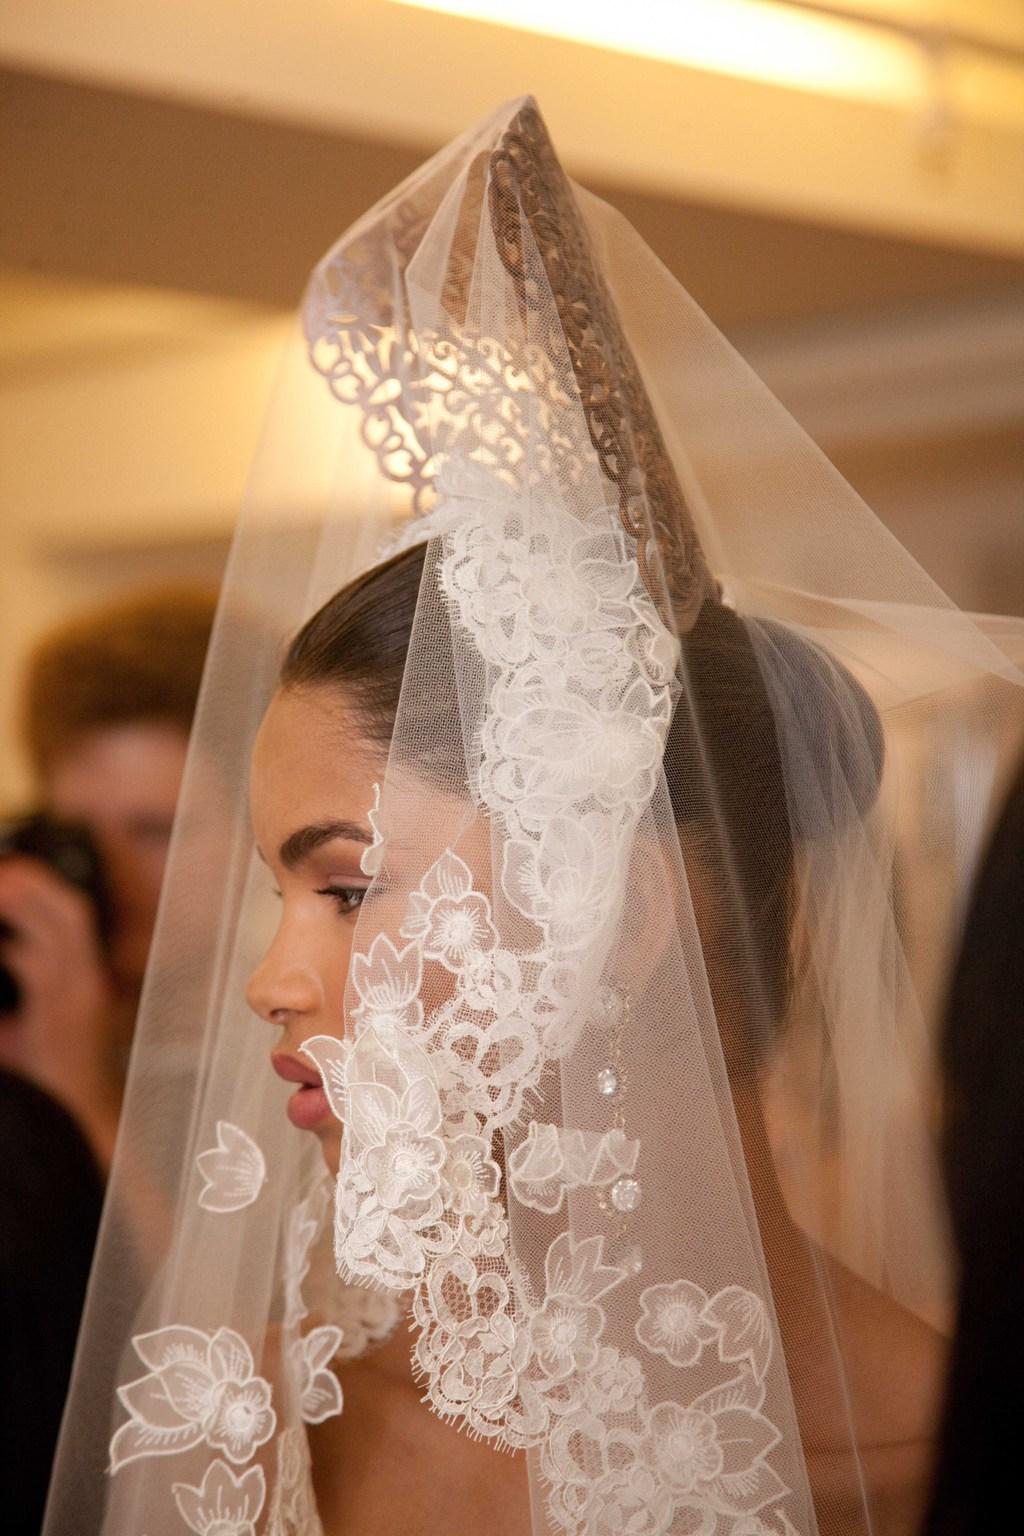 Spring-2013-wedding-dress-oscar-de-la-renta-bridal-gowns-lace-veil.full